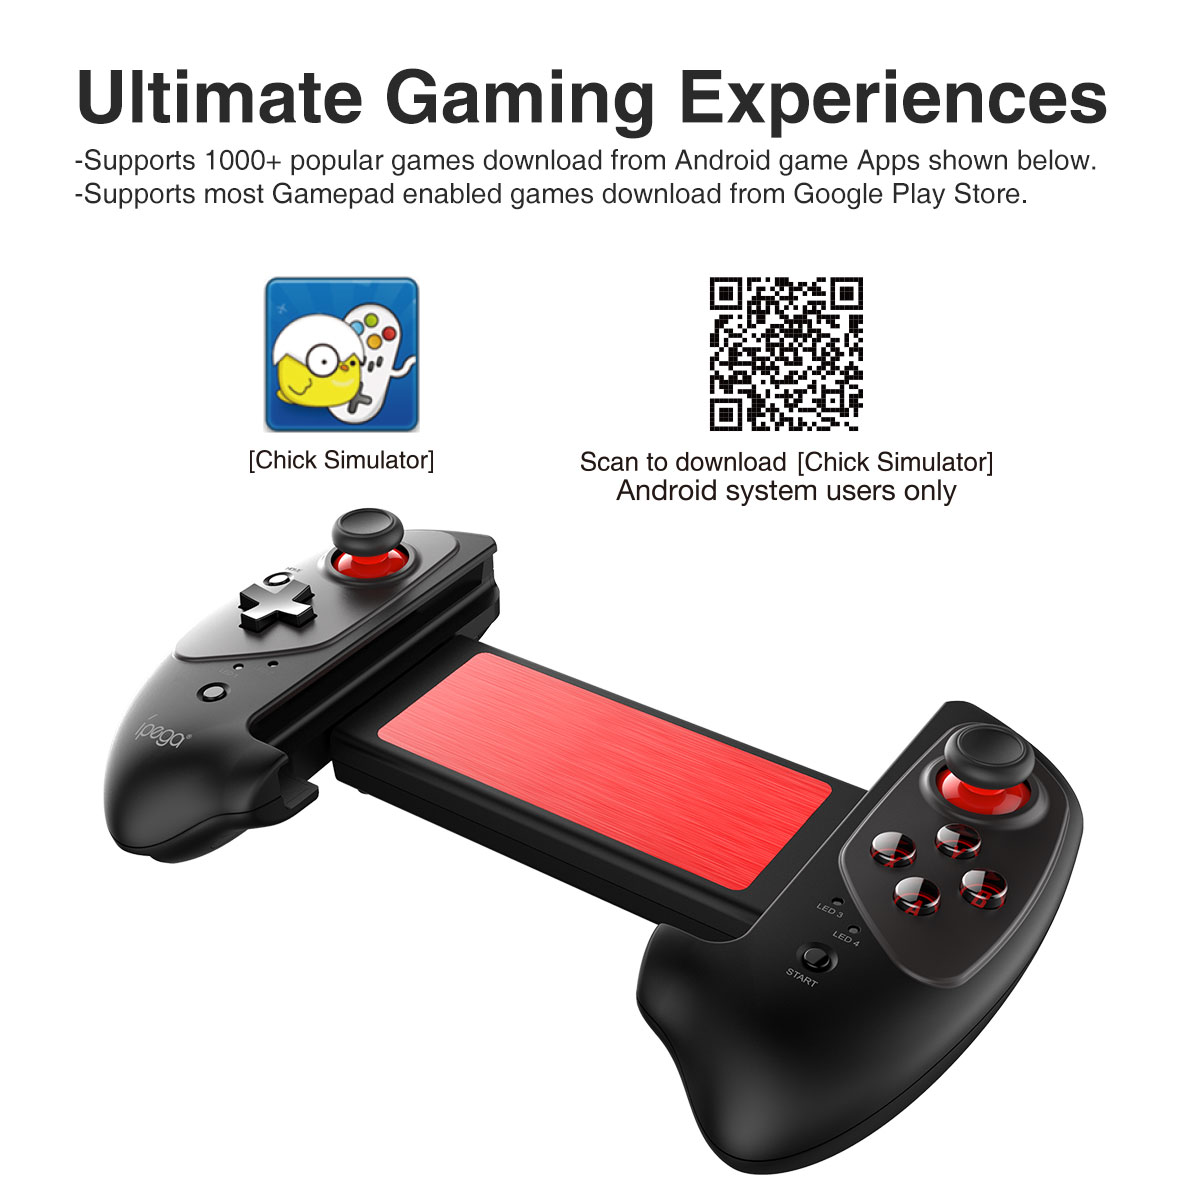 Ipega 9083 Wireless Extending Game controller-Game